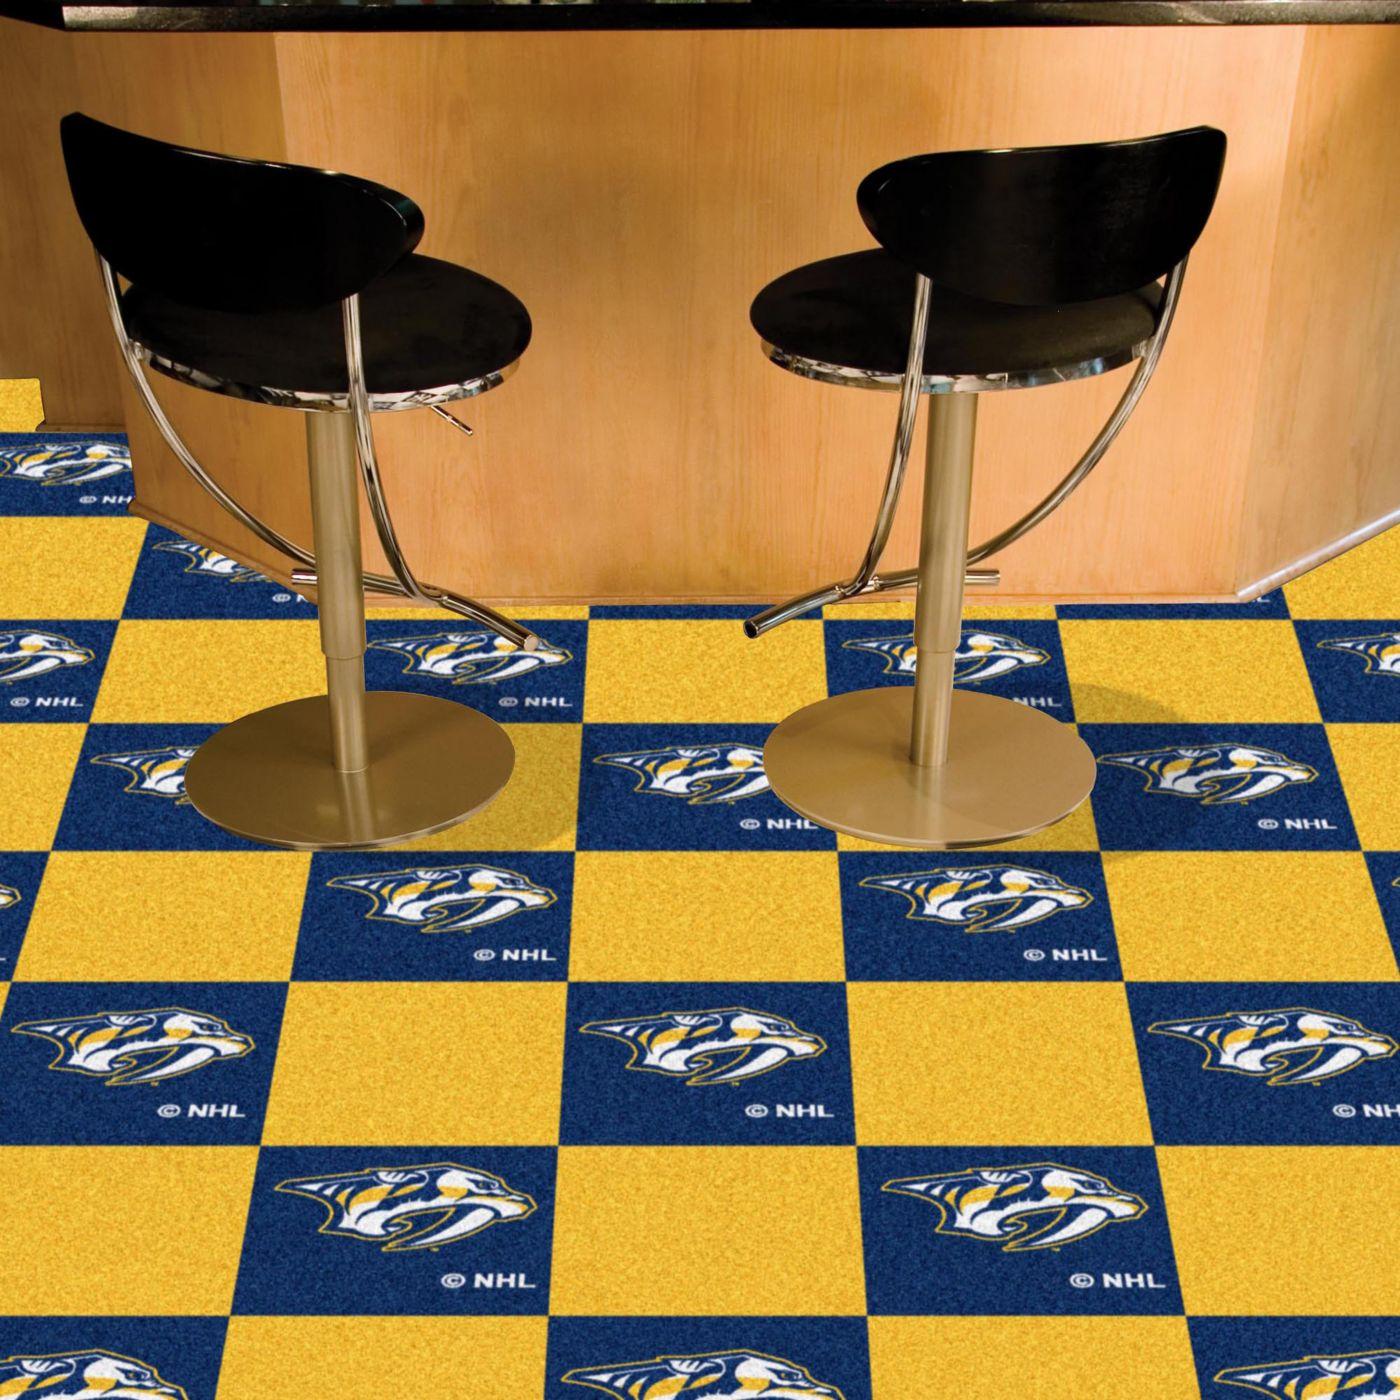 FANMATS Nashville Predators Carpet Tiles